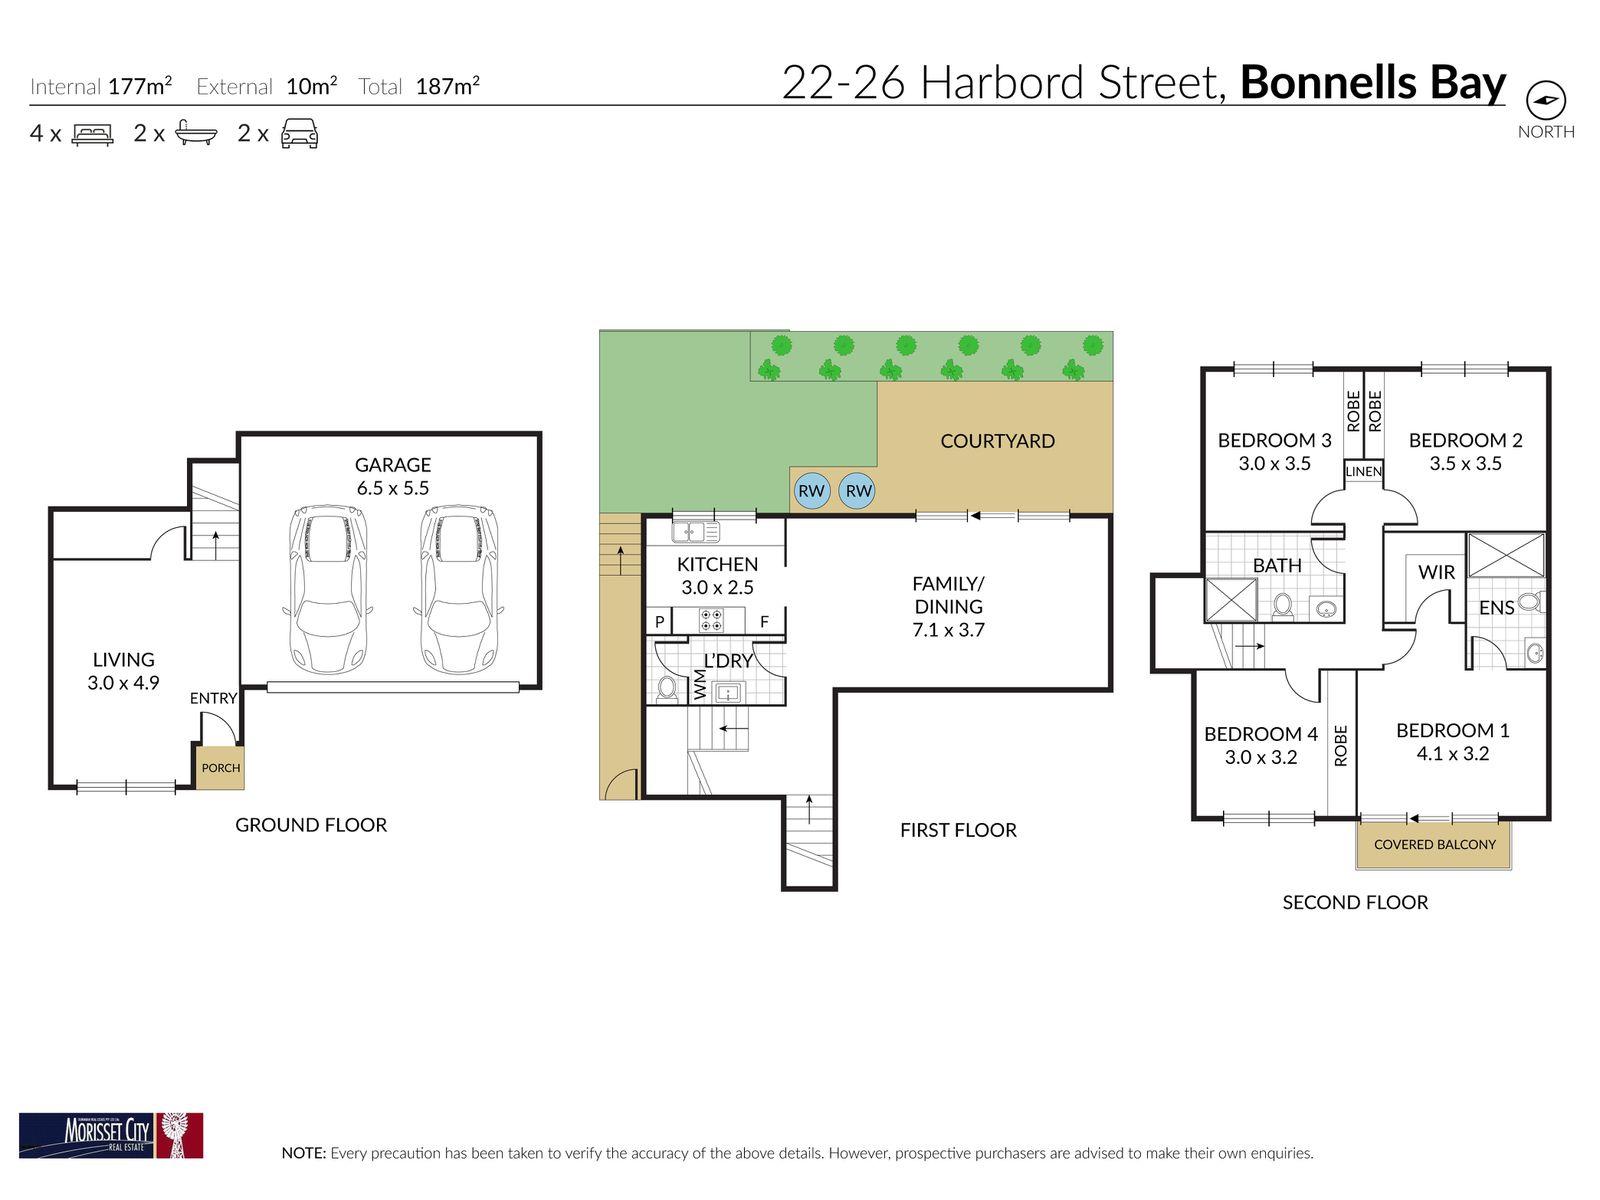 22 / 26 Harbord Street, Bonnells Bay